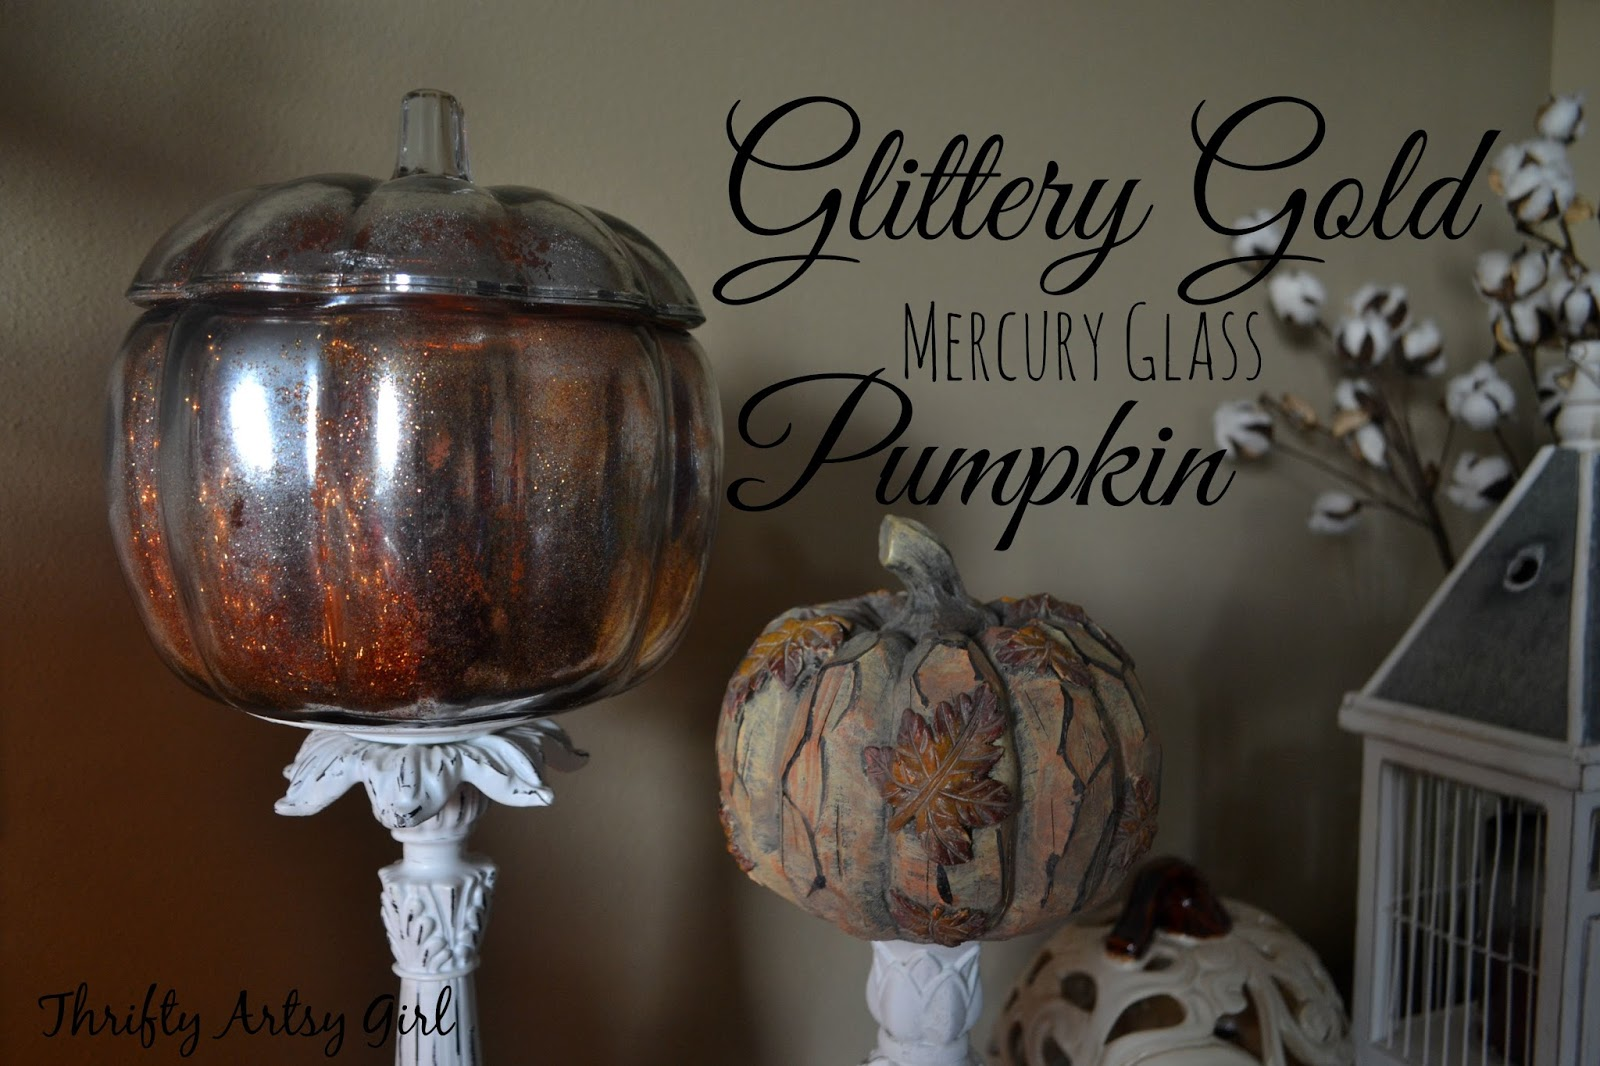 Thrifty artsy girl diy gold glitter mercury glass pumpkin diy gold glitter mercury glass pumpkin solutioingenieria Choice Image